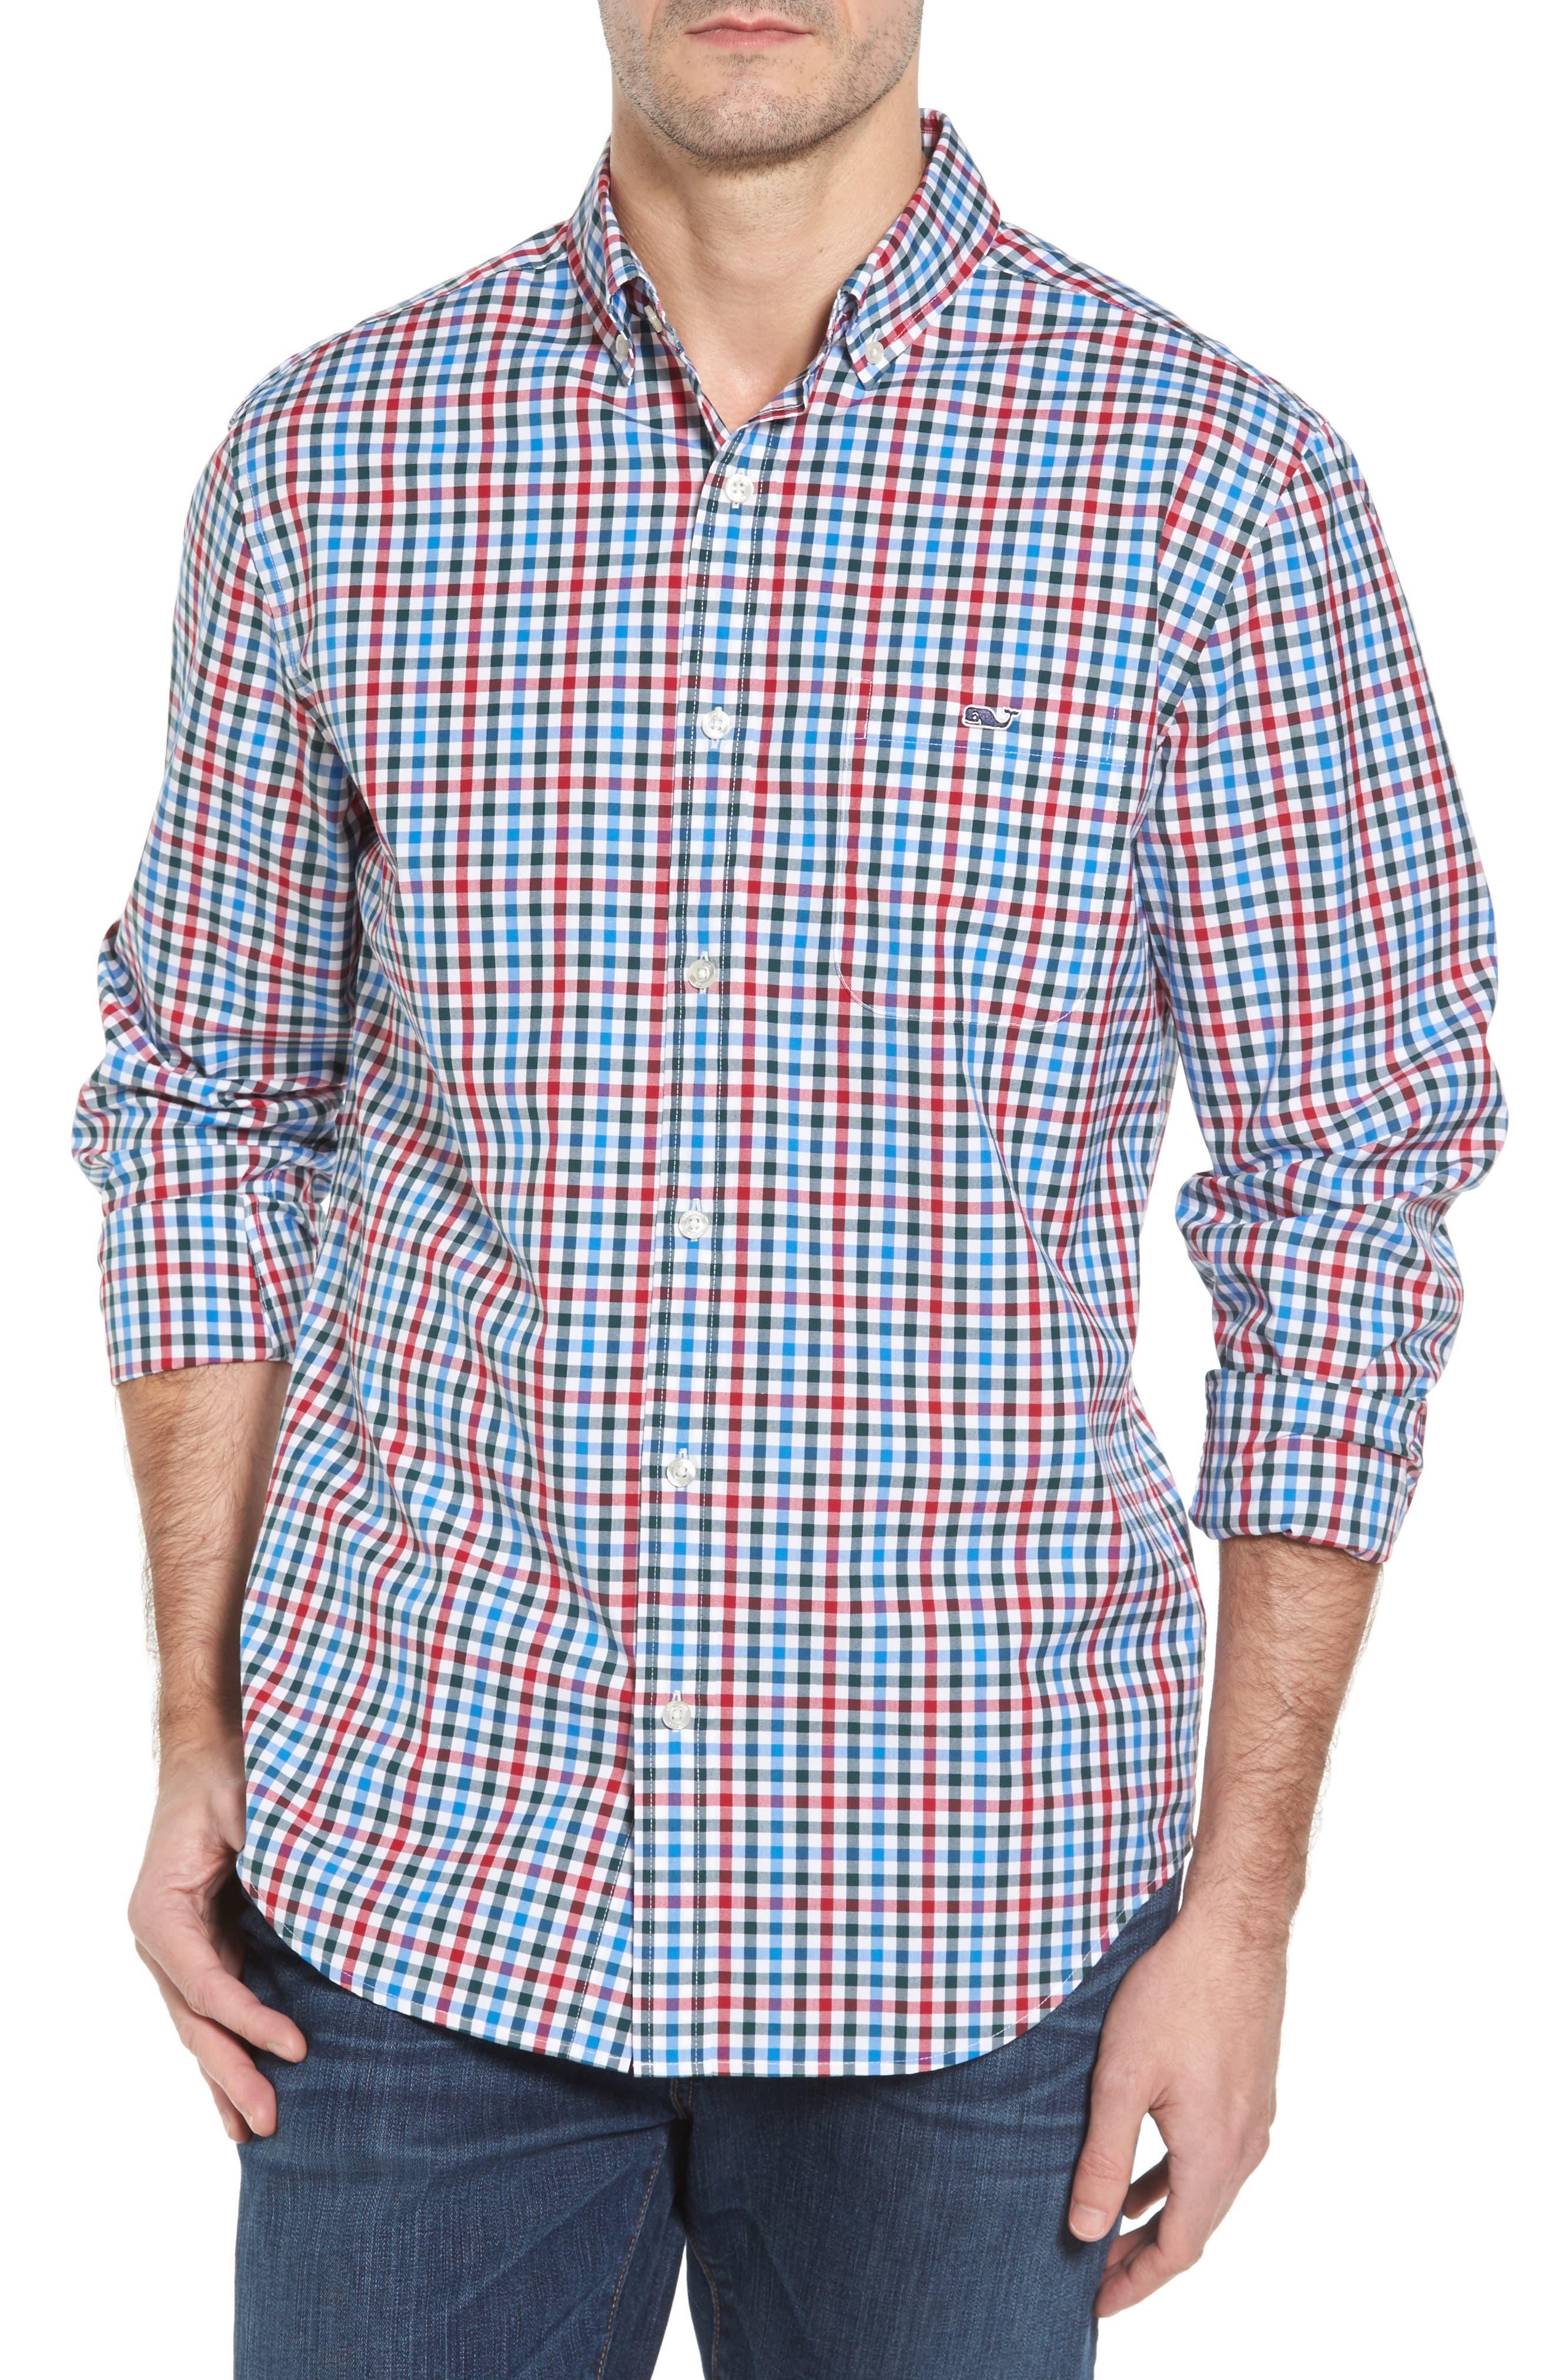 Higgins Beach Classic Fit Gingham Sport Shirt,                         Main,                         color, 620